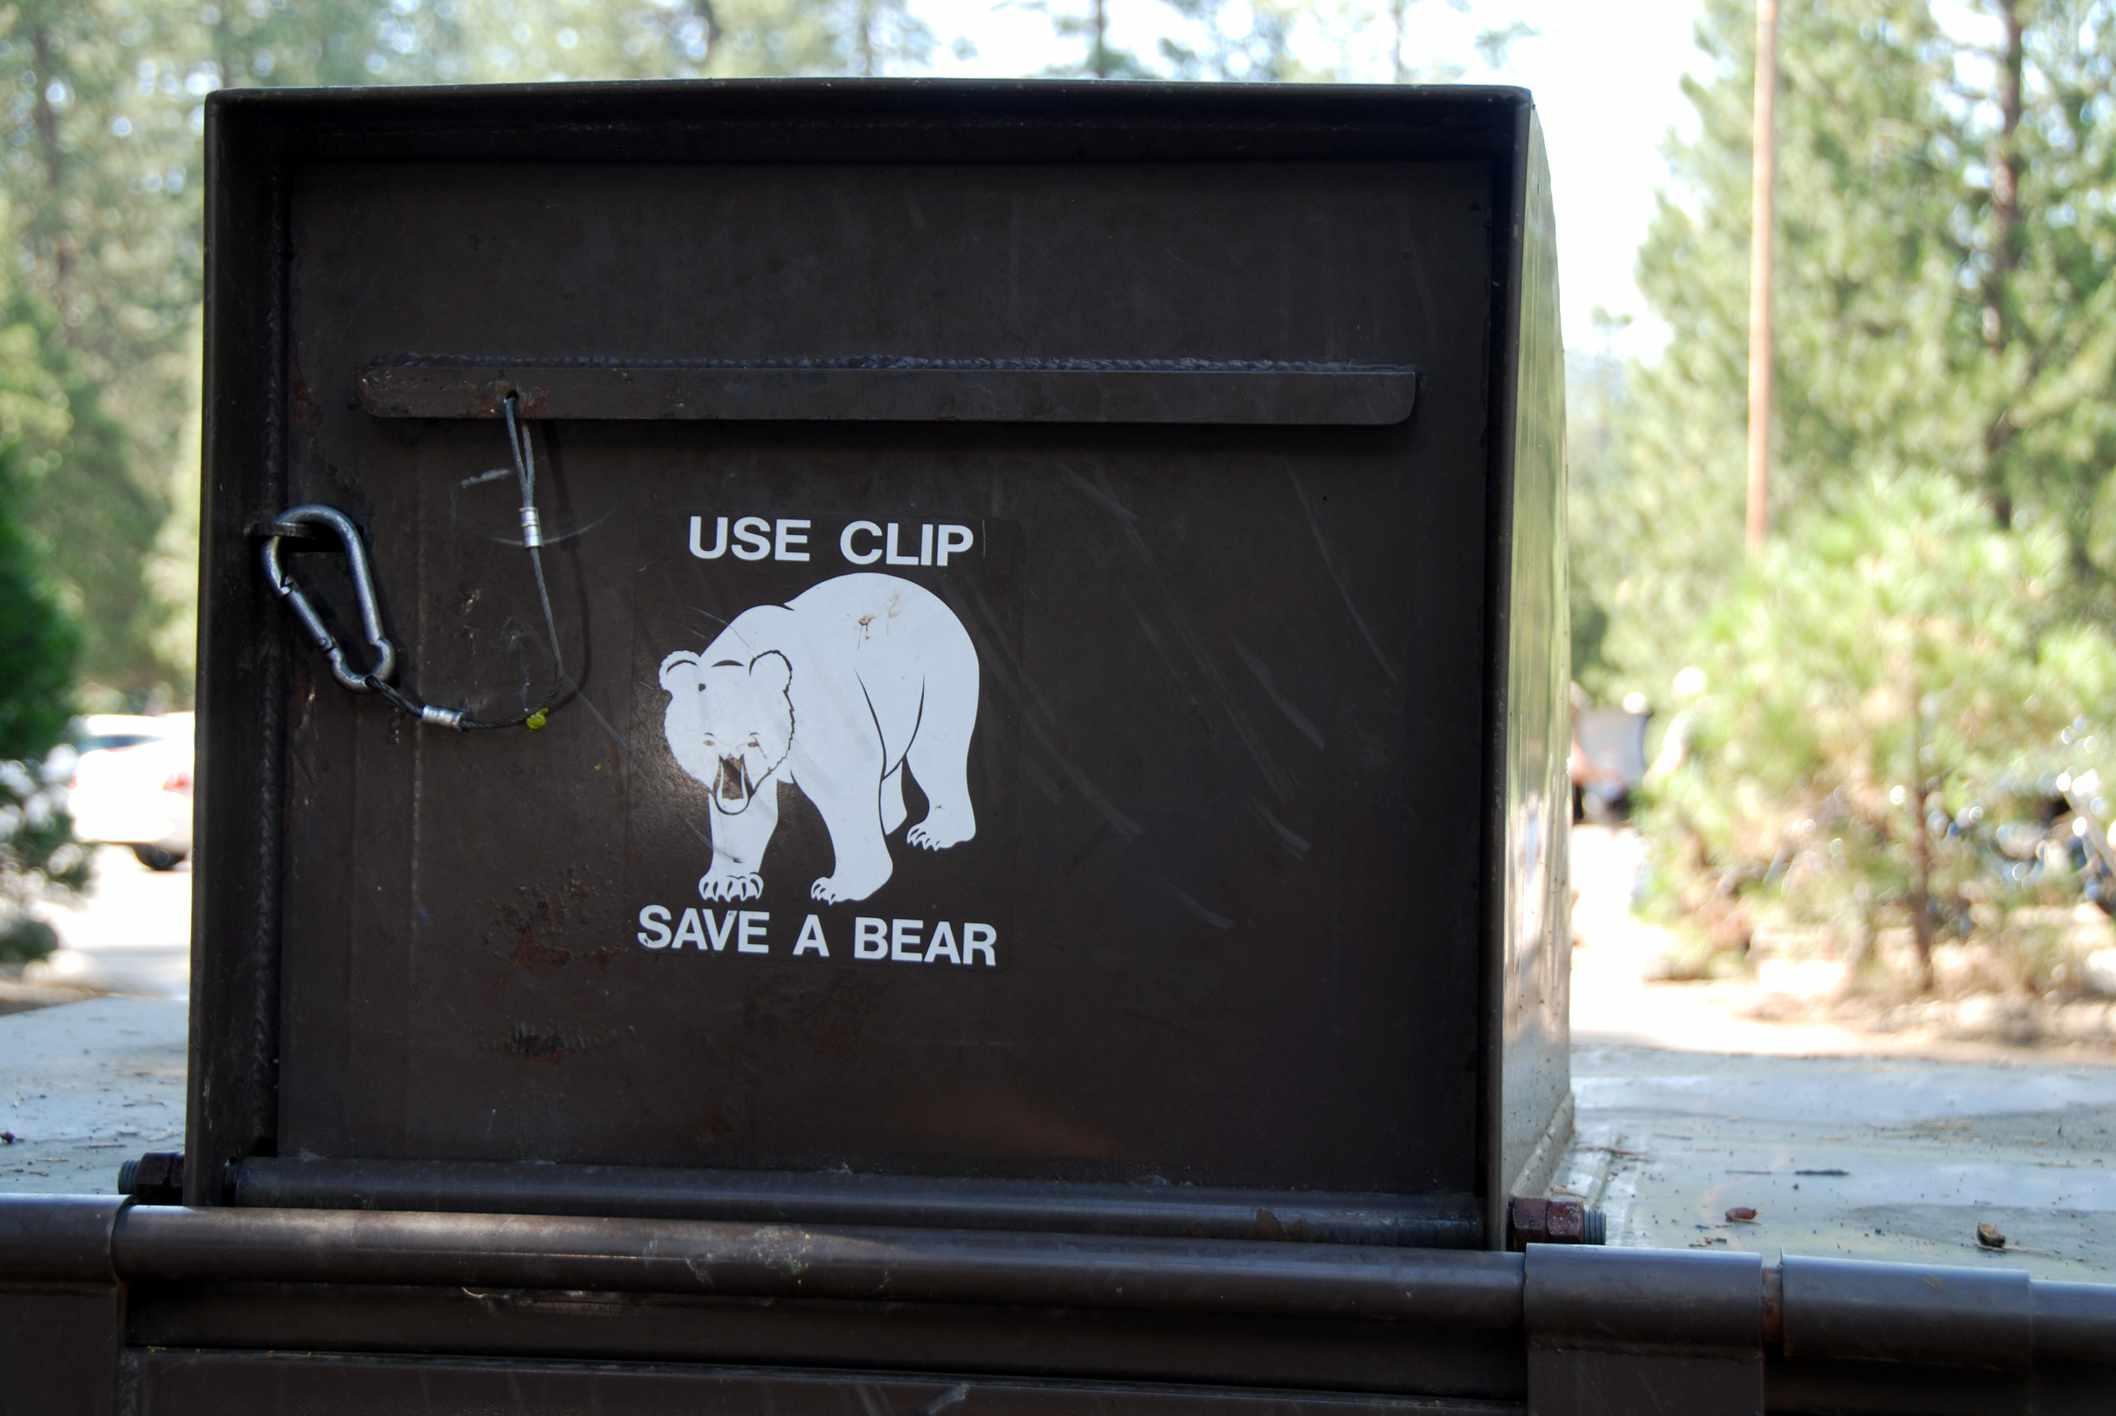 Wildlife-proof garbage bin in Yosemite National Park